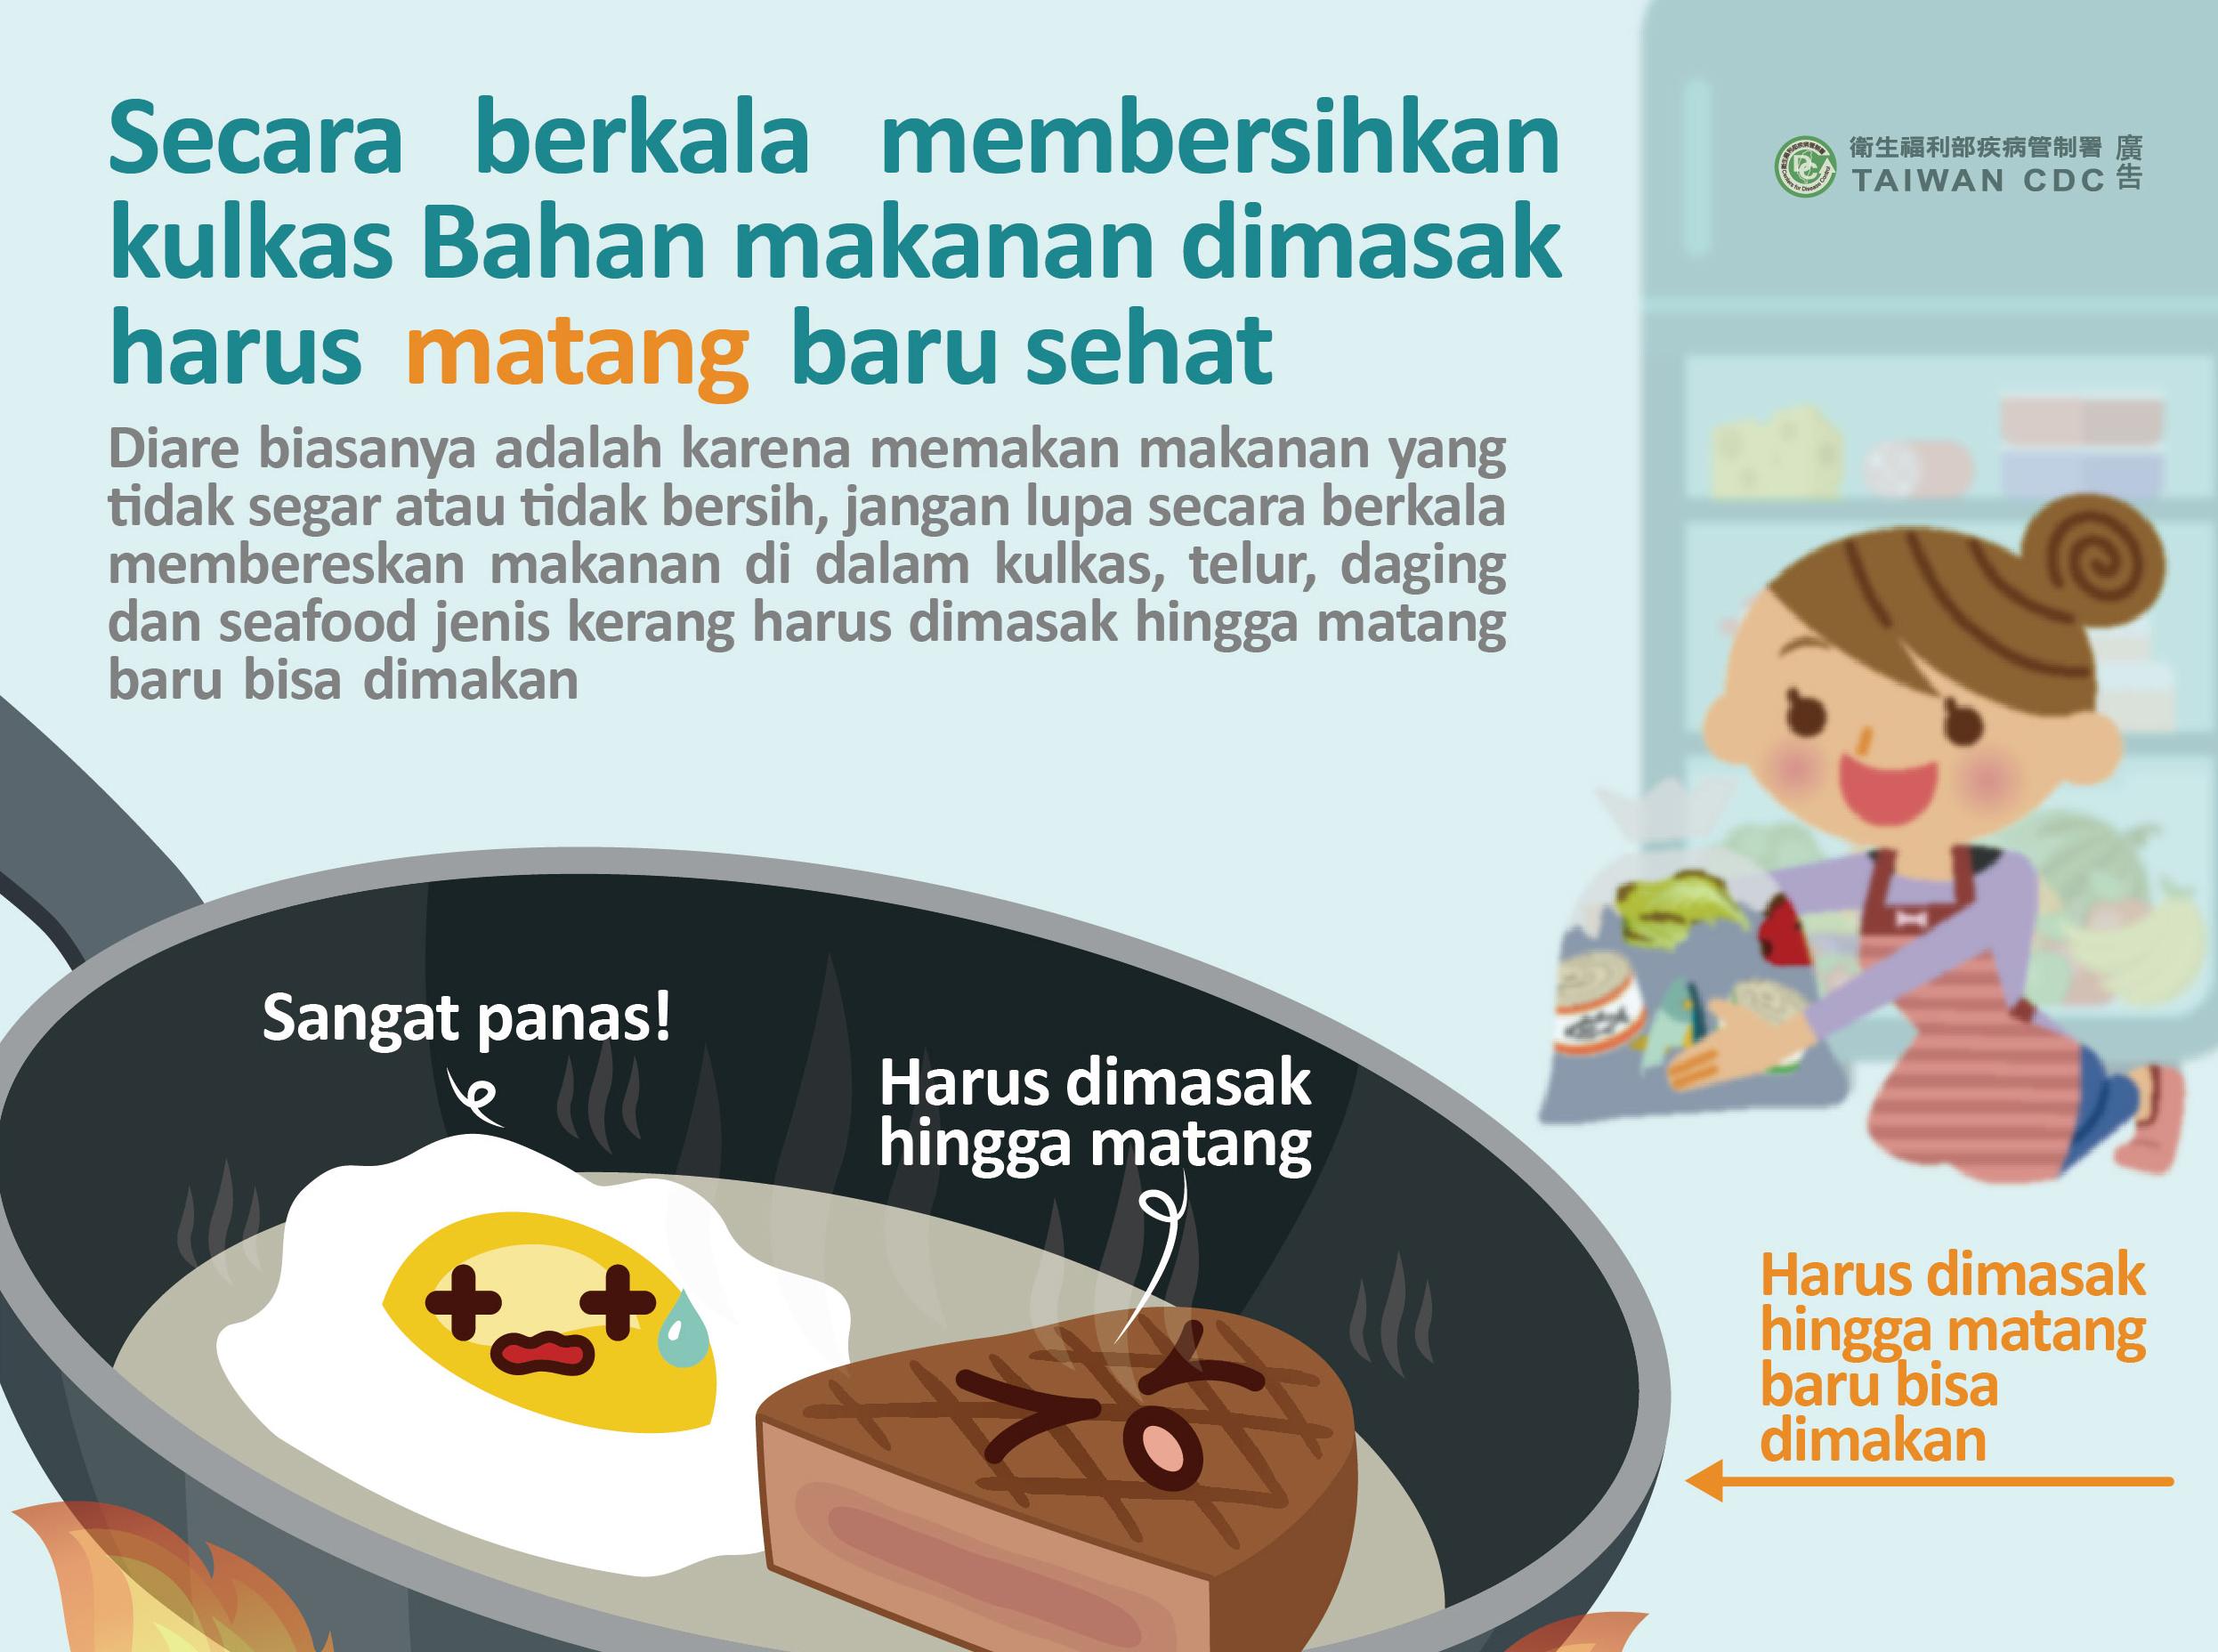 詳如附件【Klik】Secara berkala membersihkan kulkas Bahan makanan dimasak harus matang baru sehat定期清理電冰箱 食材煮熟才健康(印尼文)